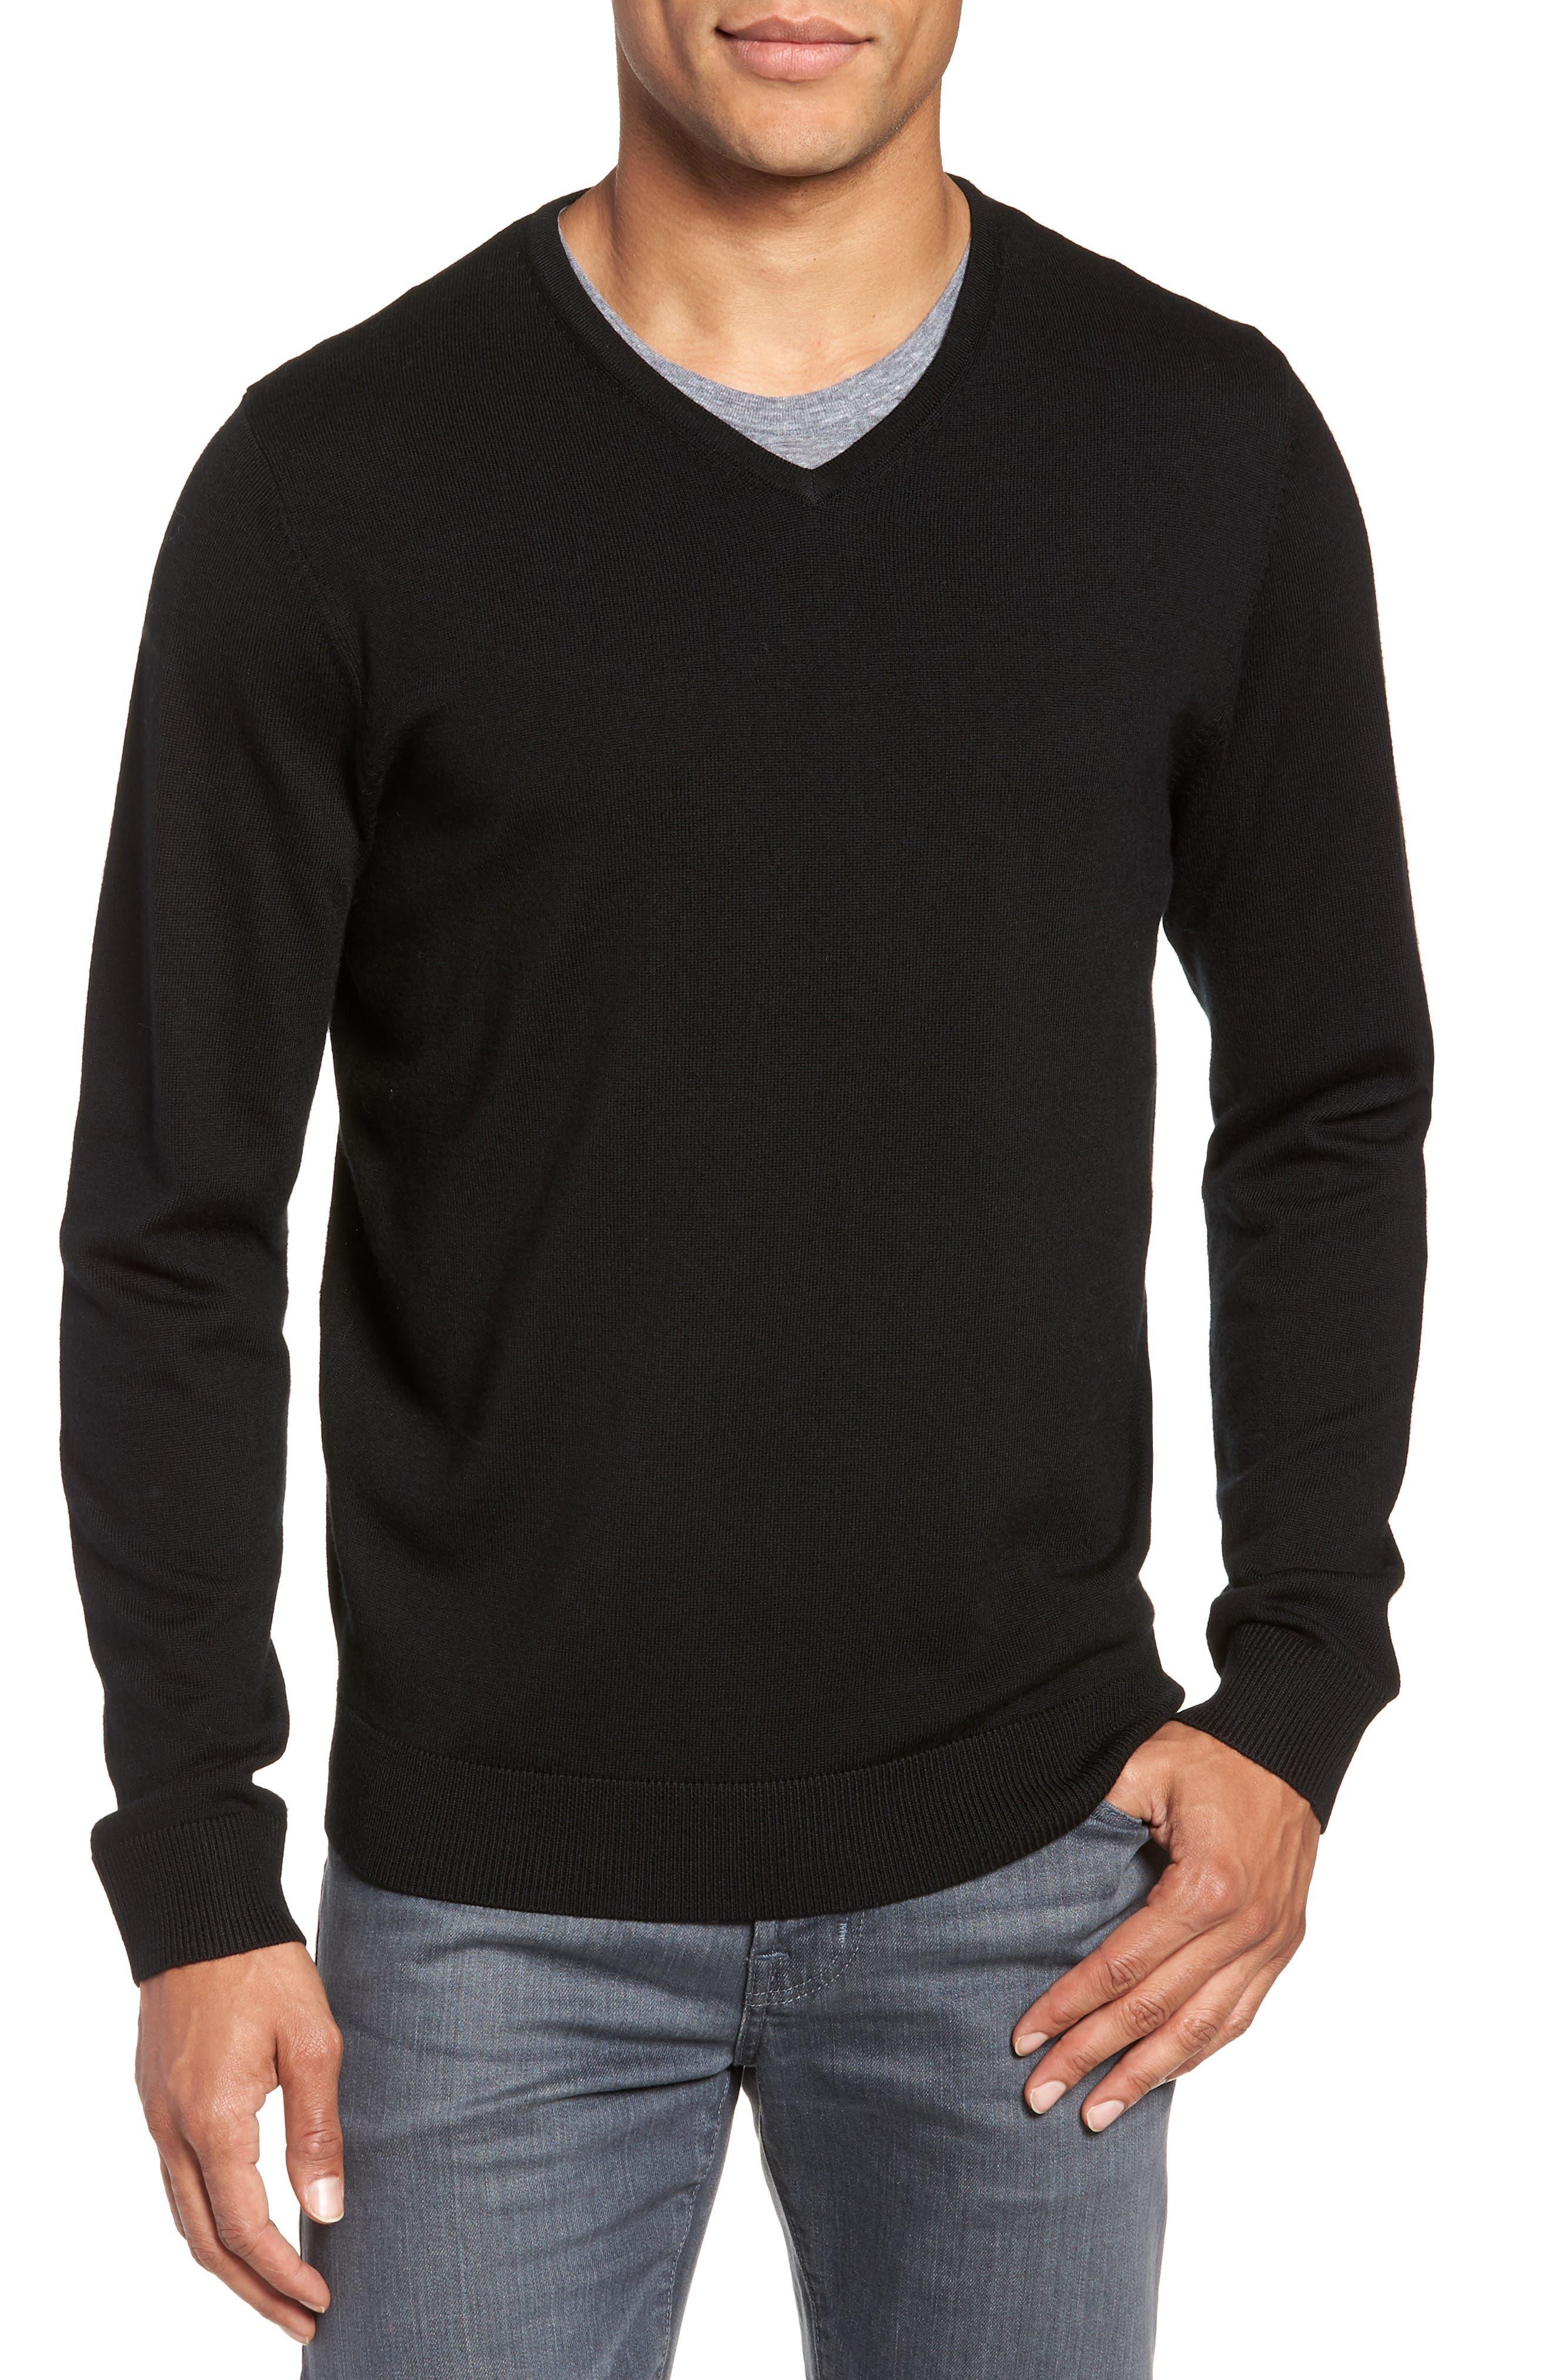 Nordstrom Shop Washable Merino Wool V-Neck Sweater, Black